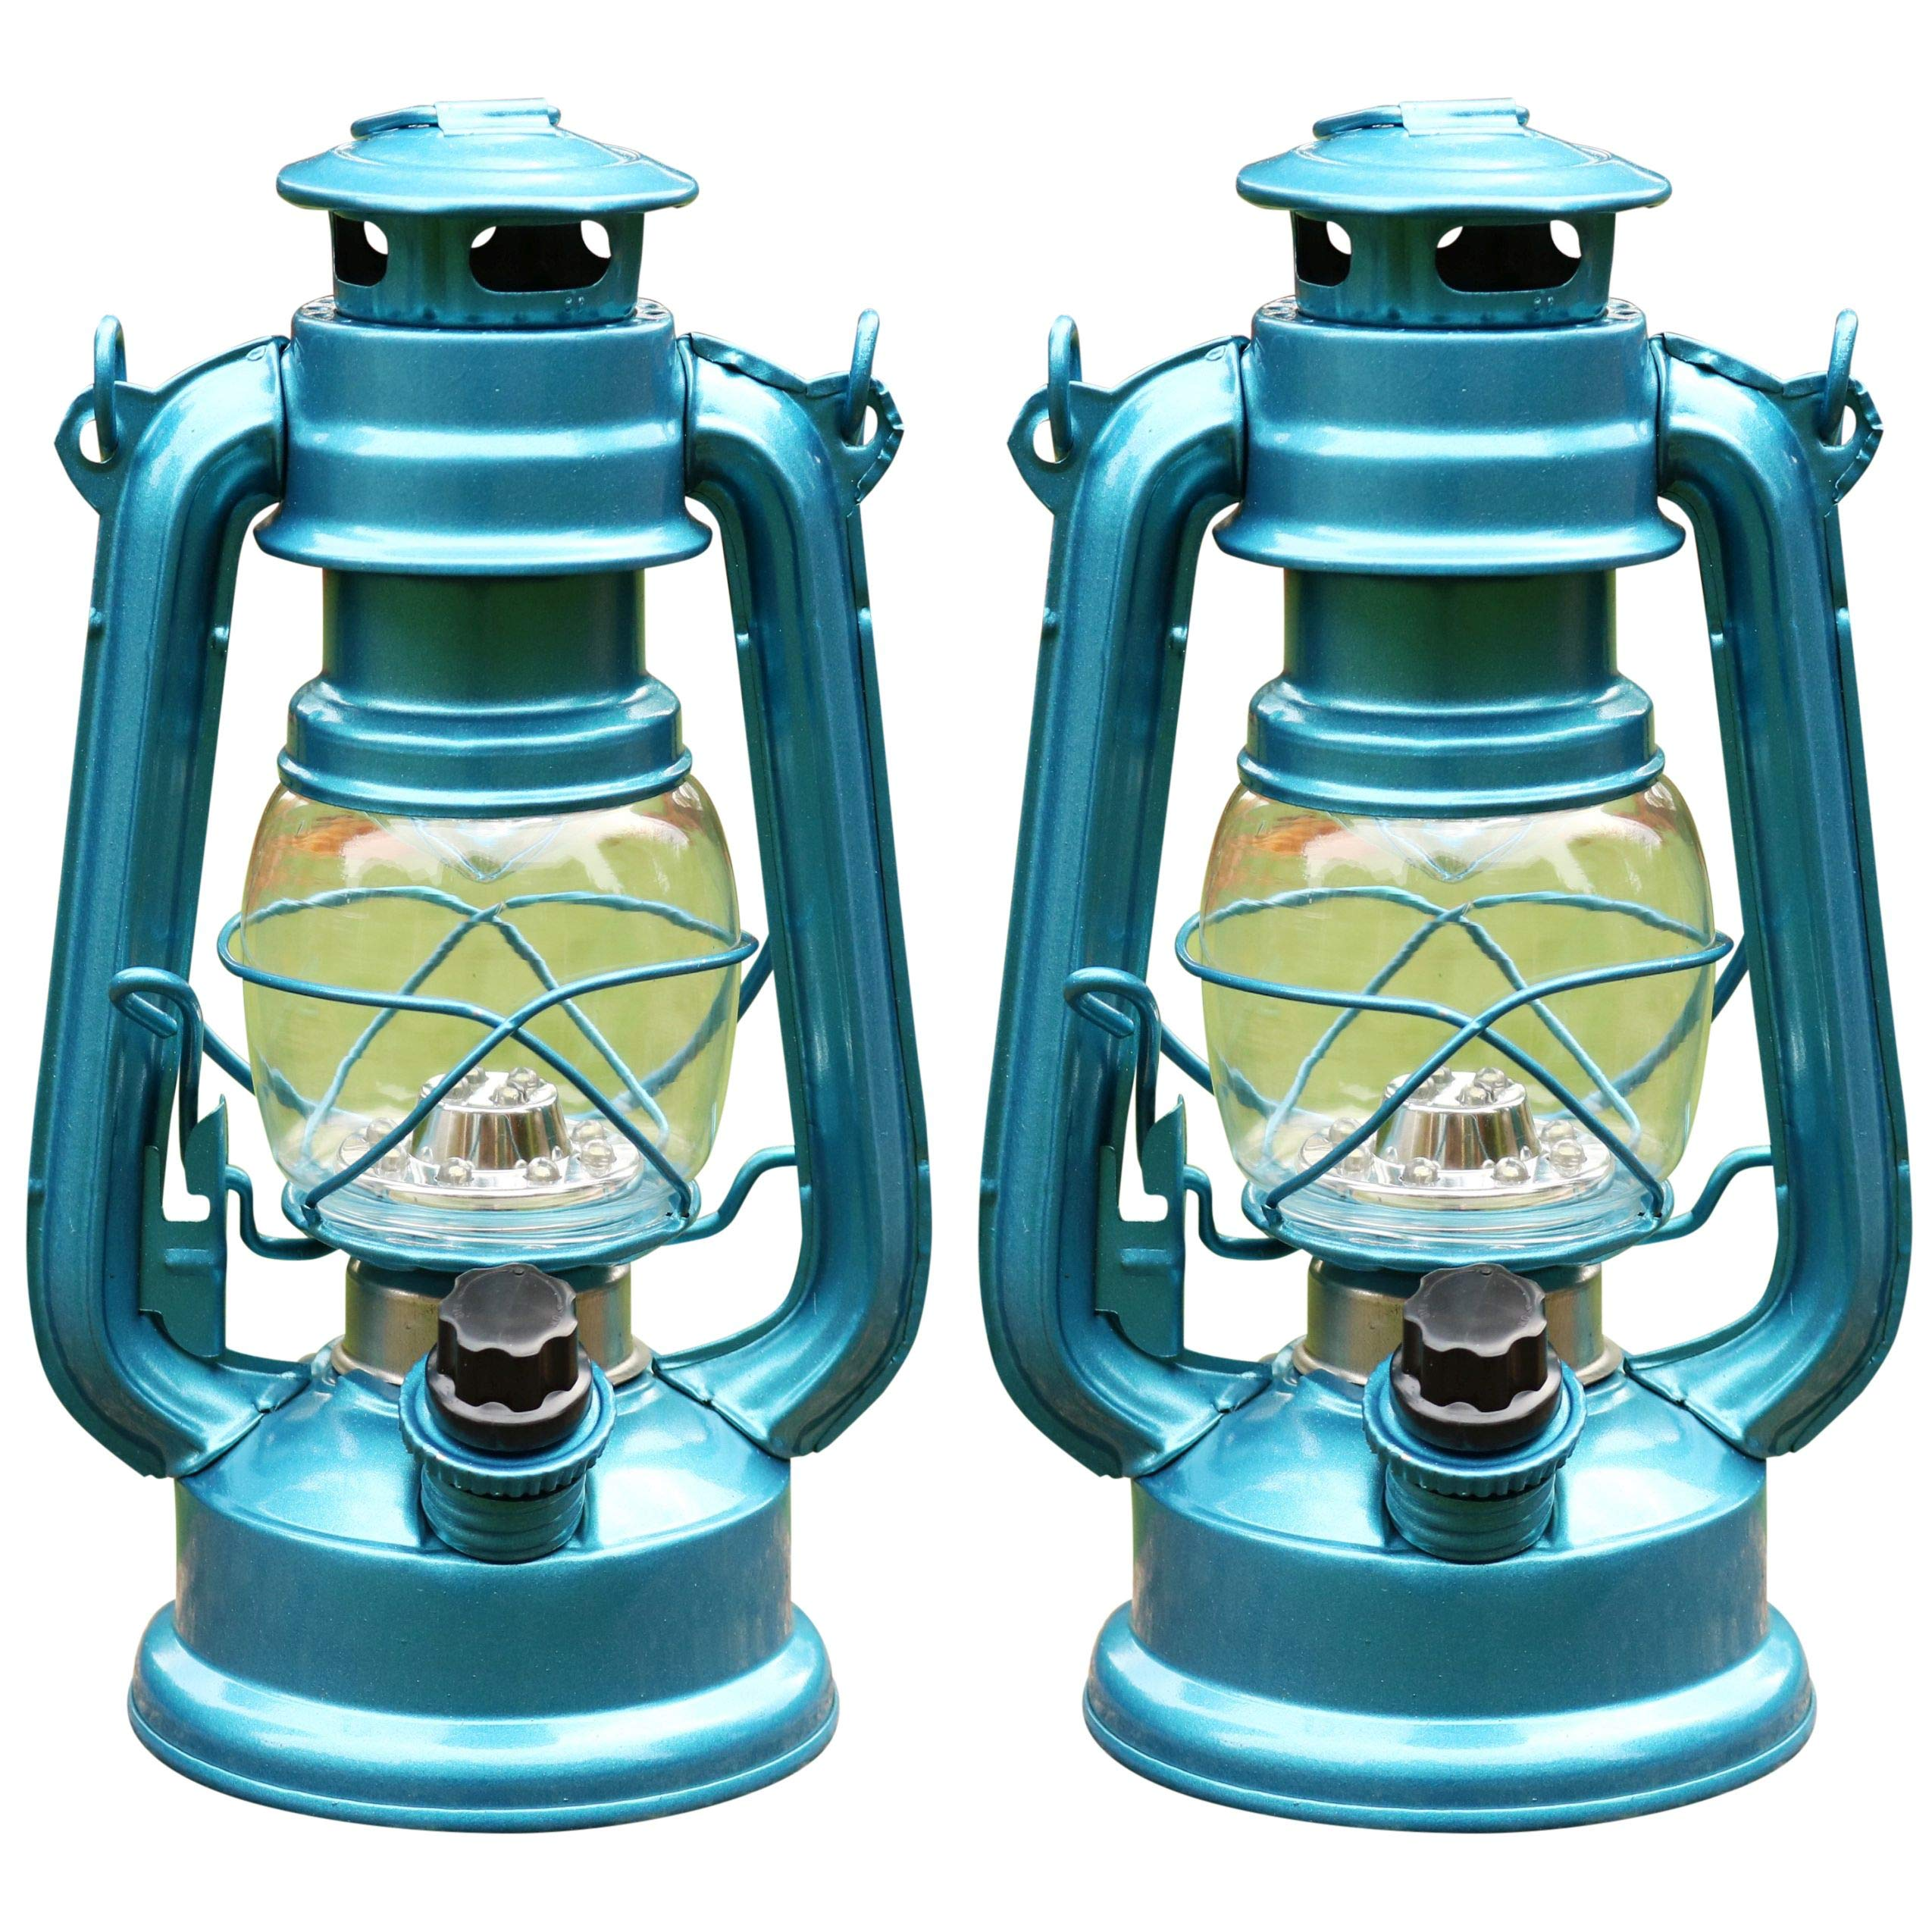 PK Green LED Hurricane Lantern, Dimmable, Set of 2